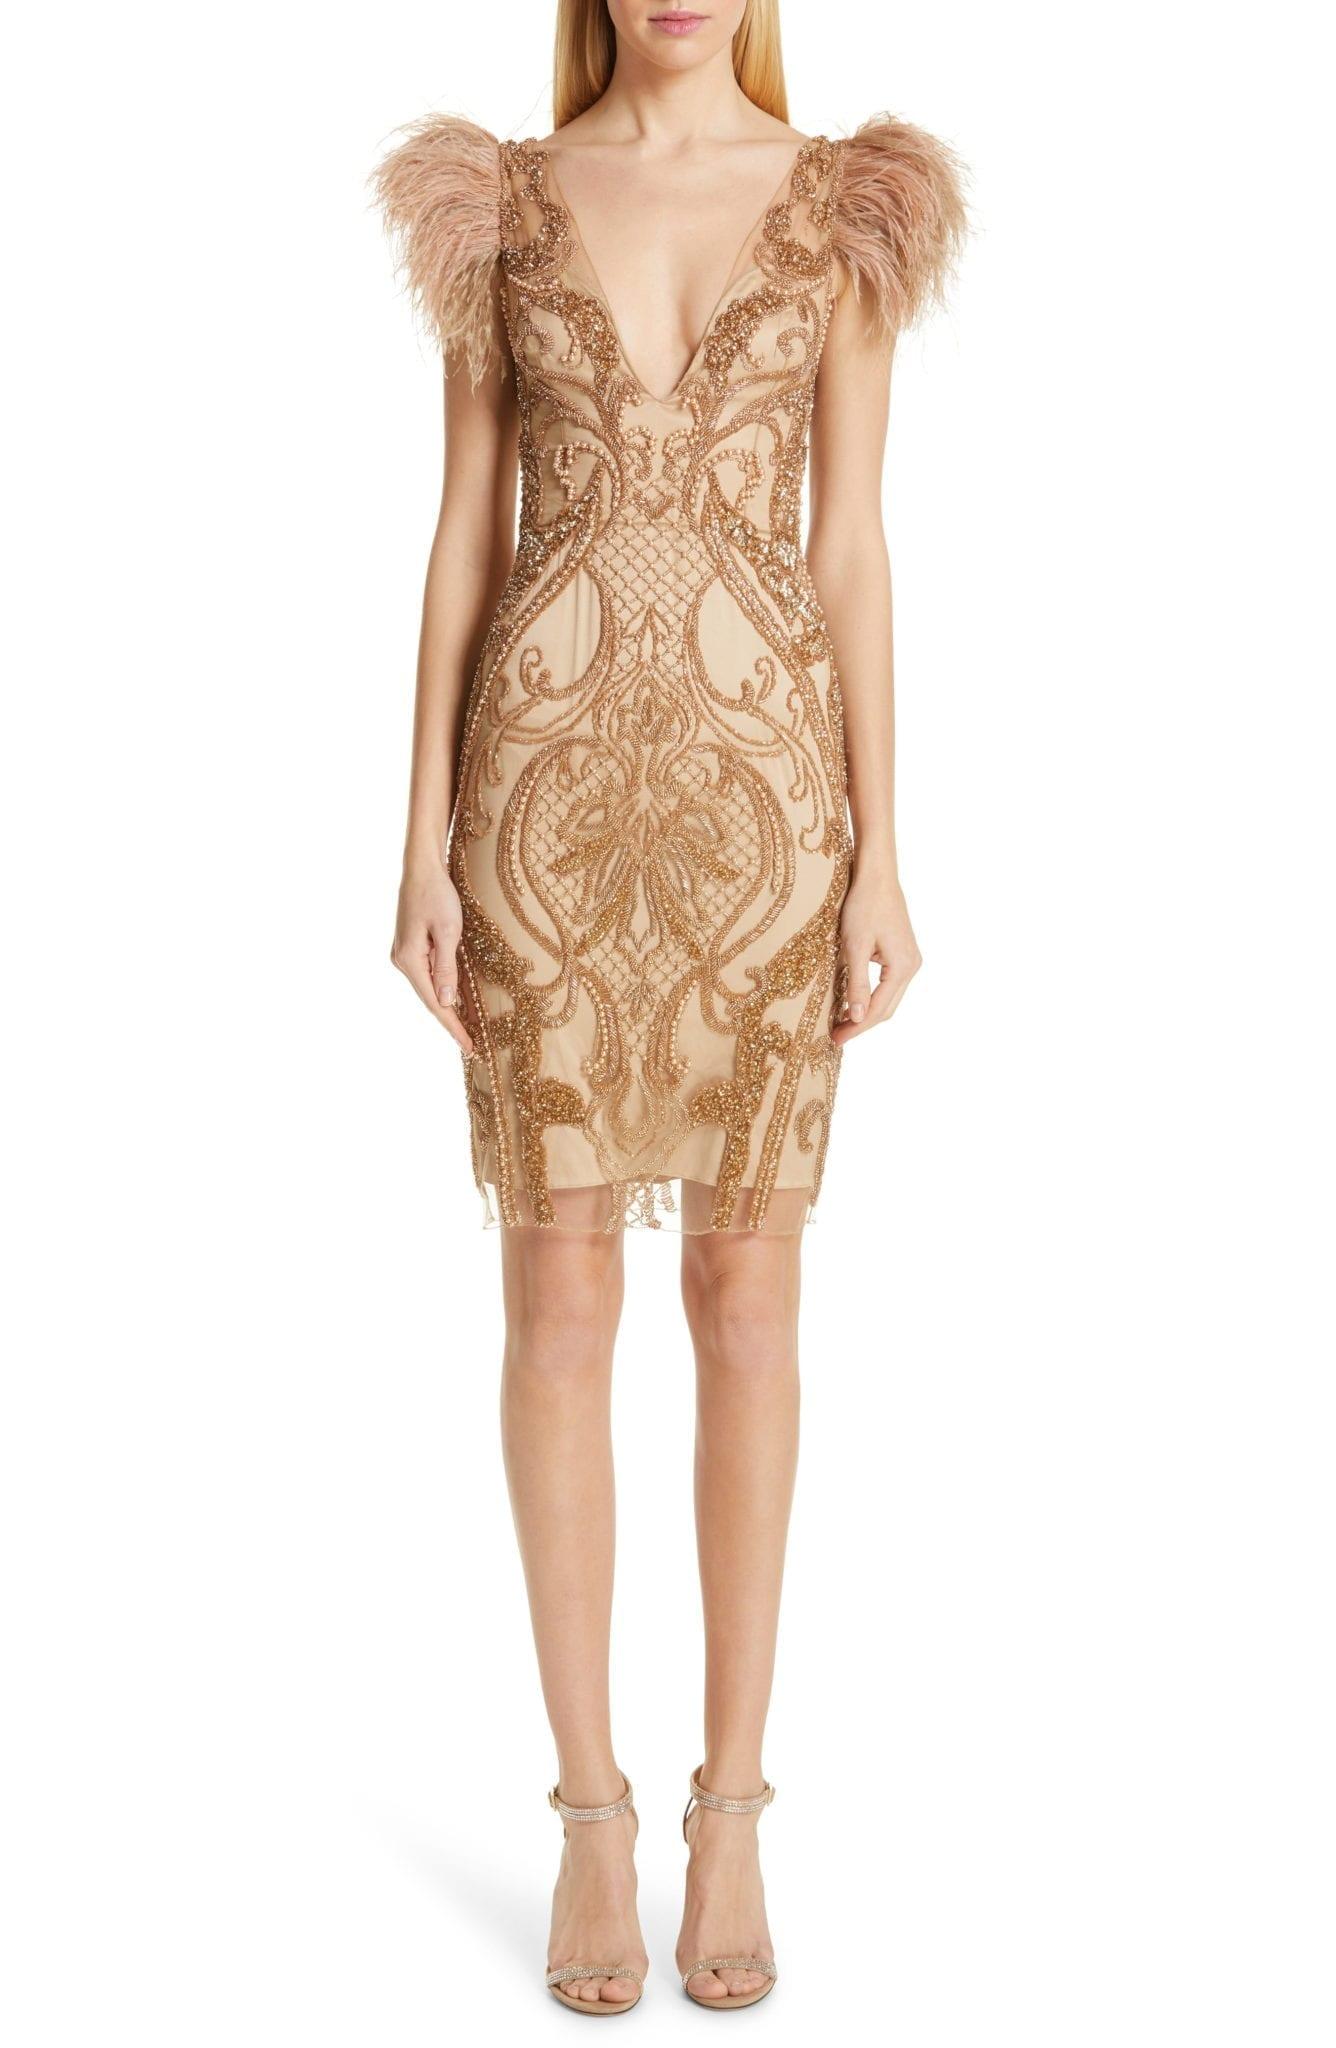 PATBO Feather Trim Beaded Mini Gold Dress